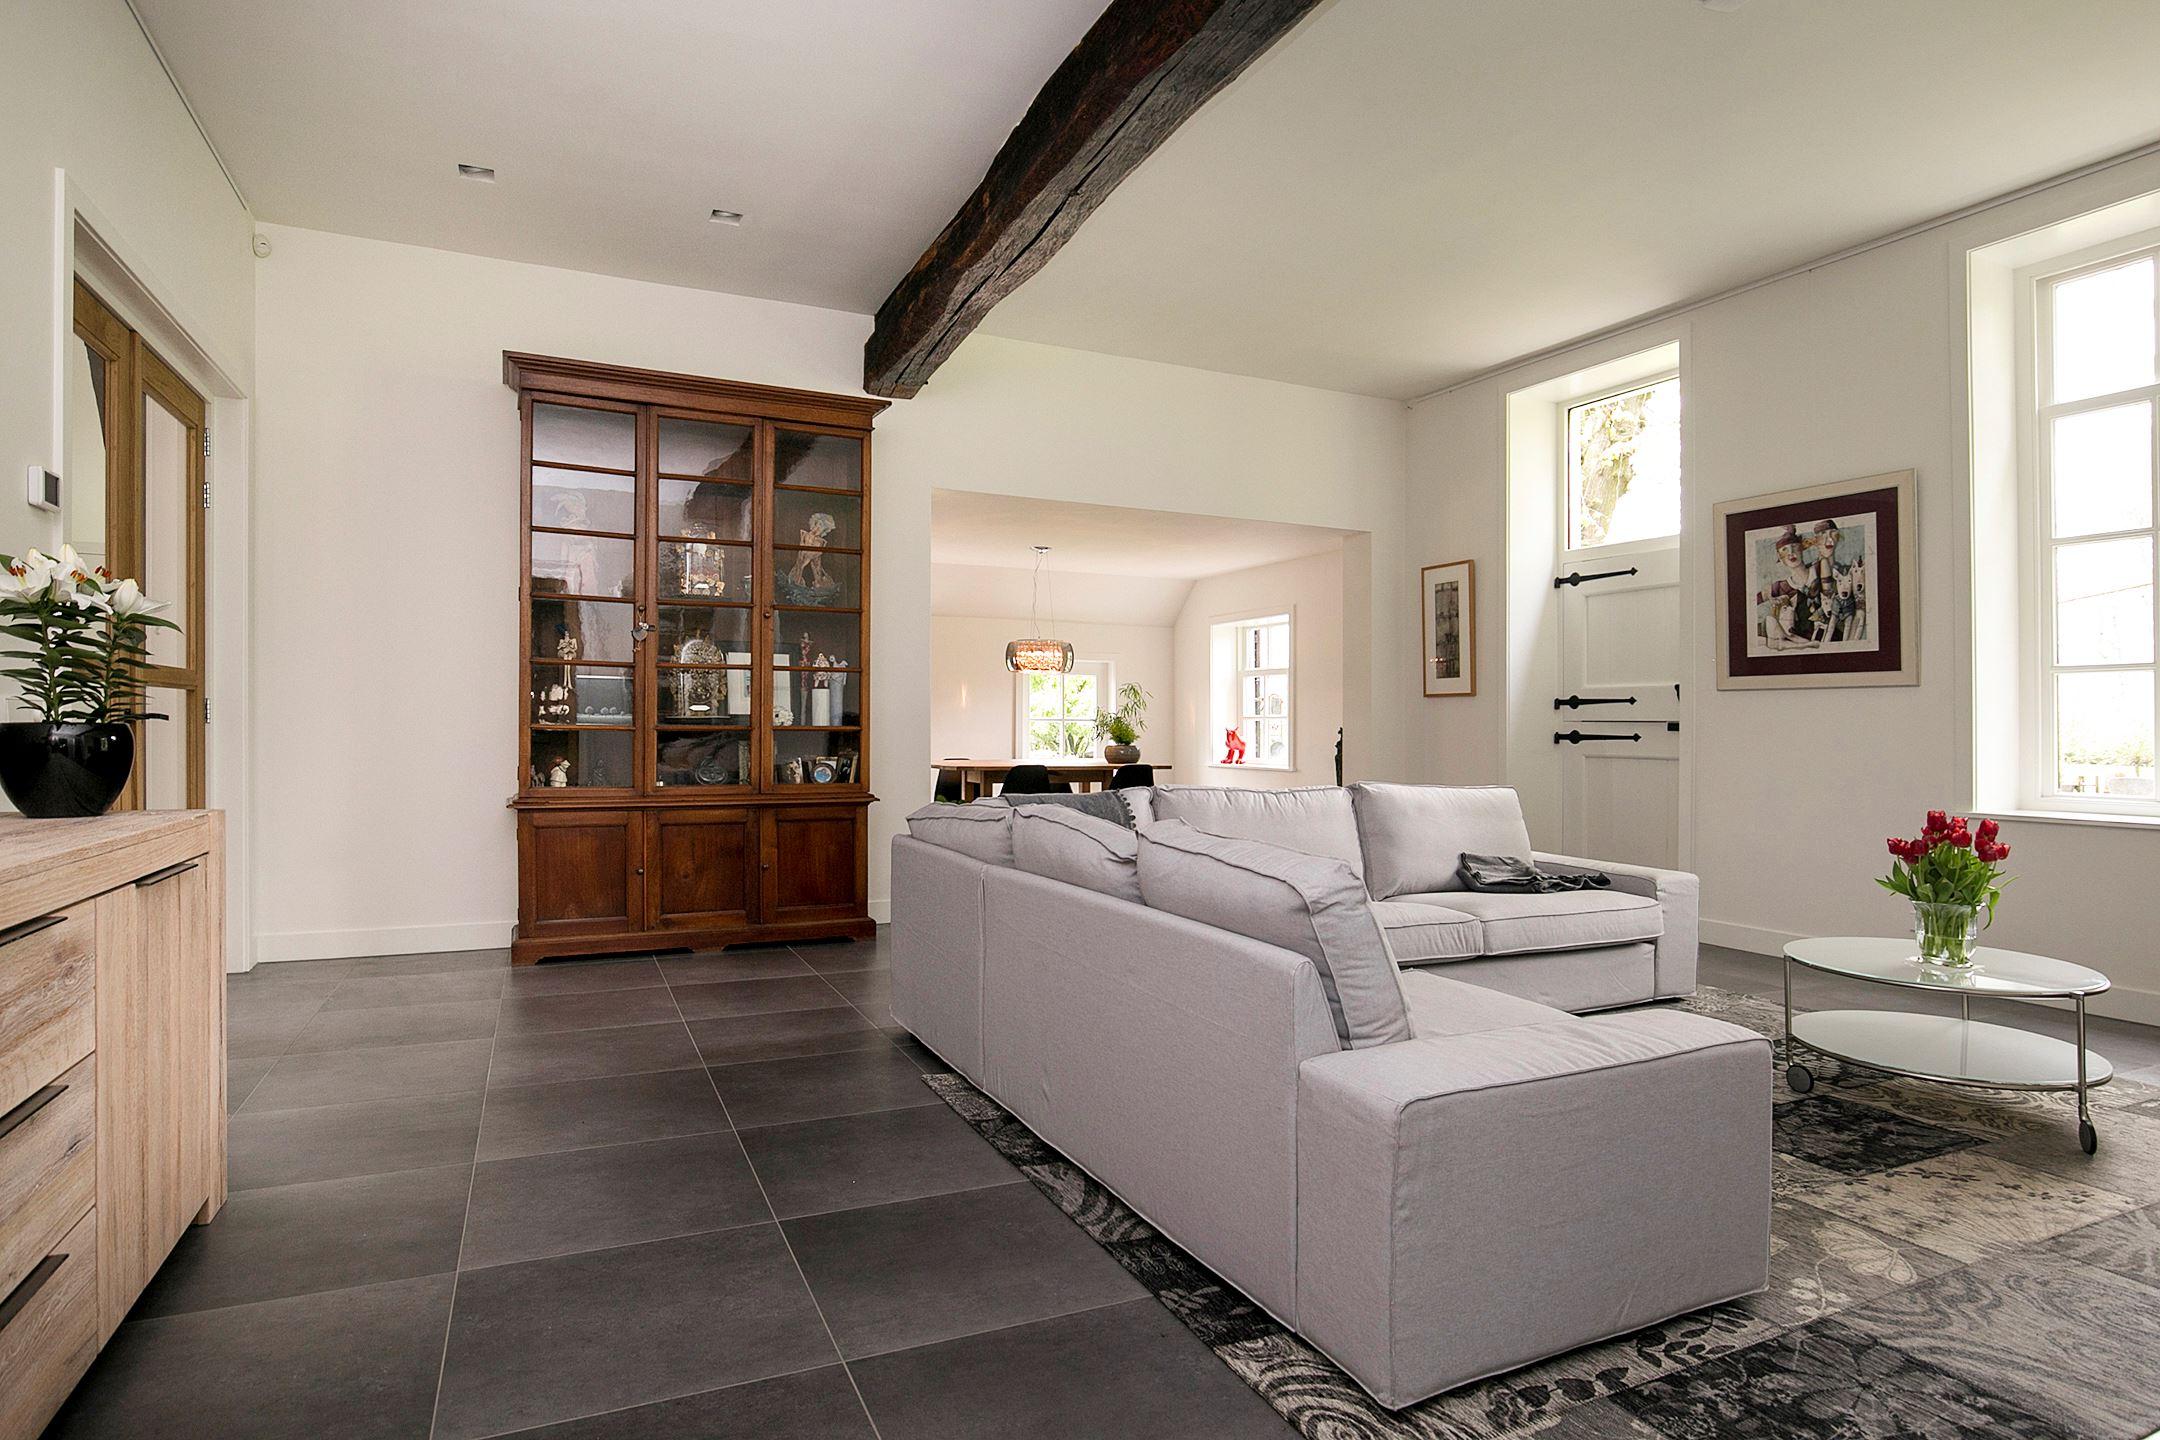 Huis te koop tempelweg pk elburg funda